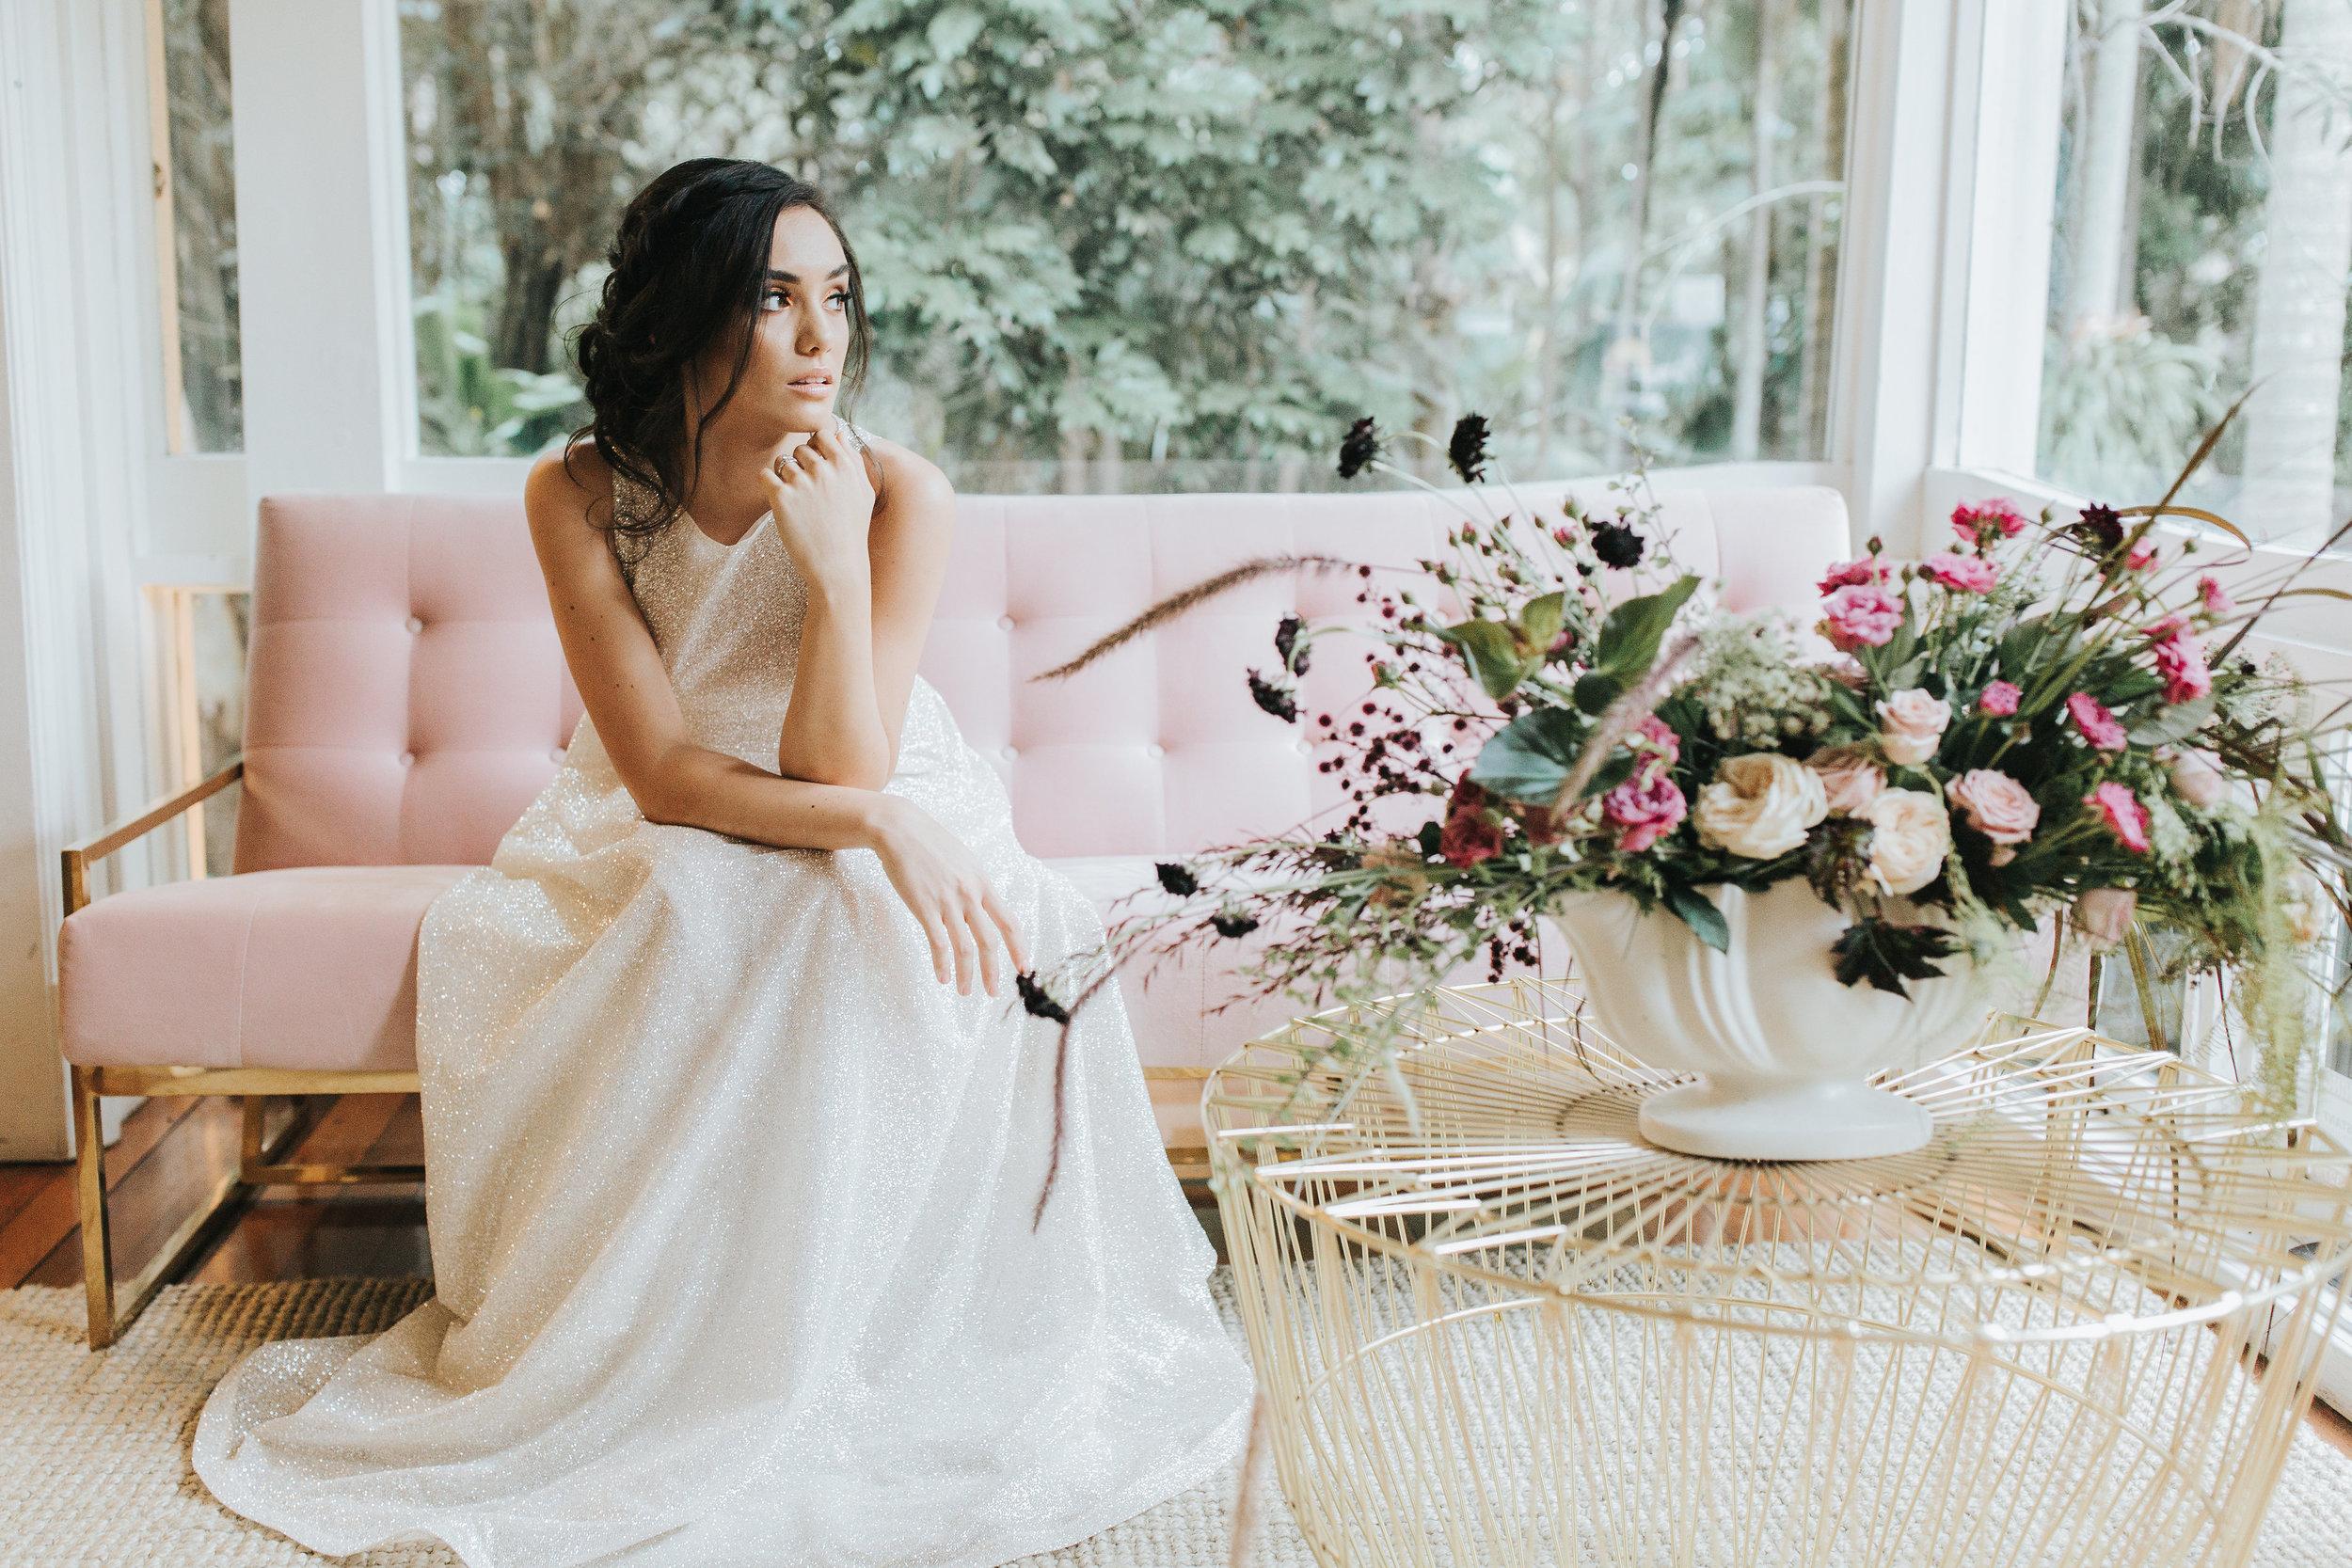 WeddingPlaybook_HighRes_MSP(313of417).jpg